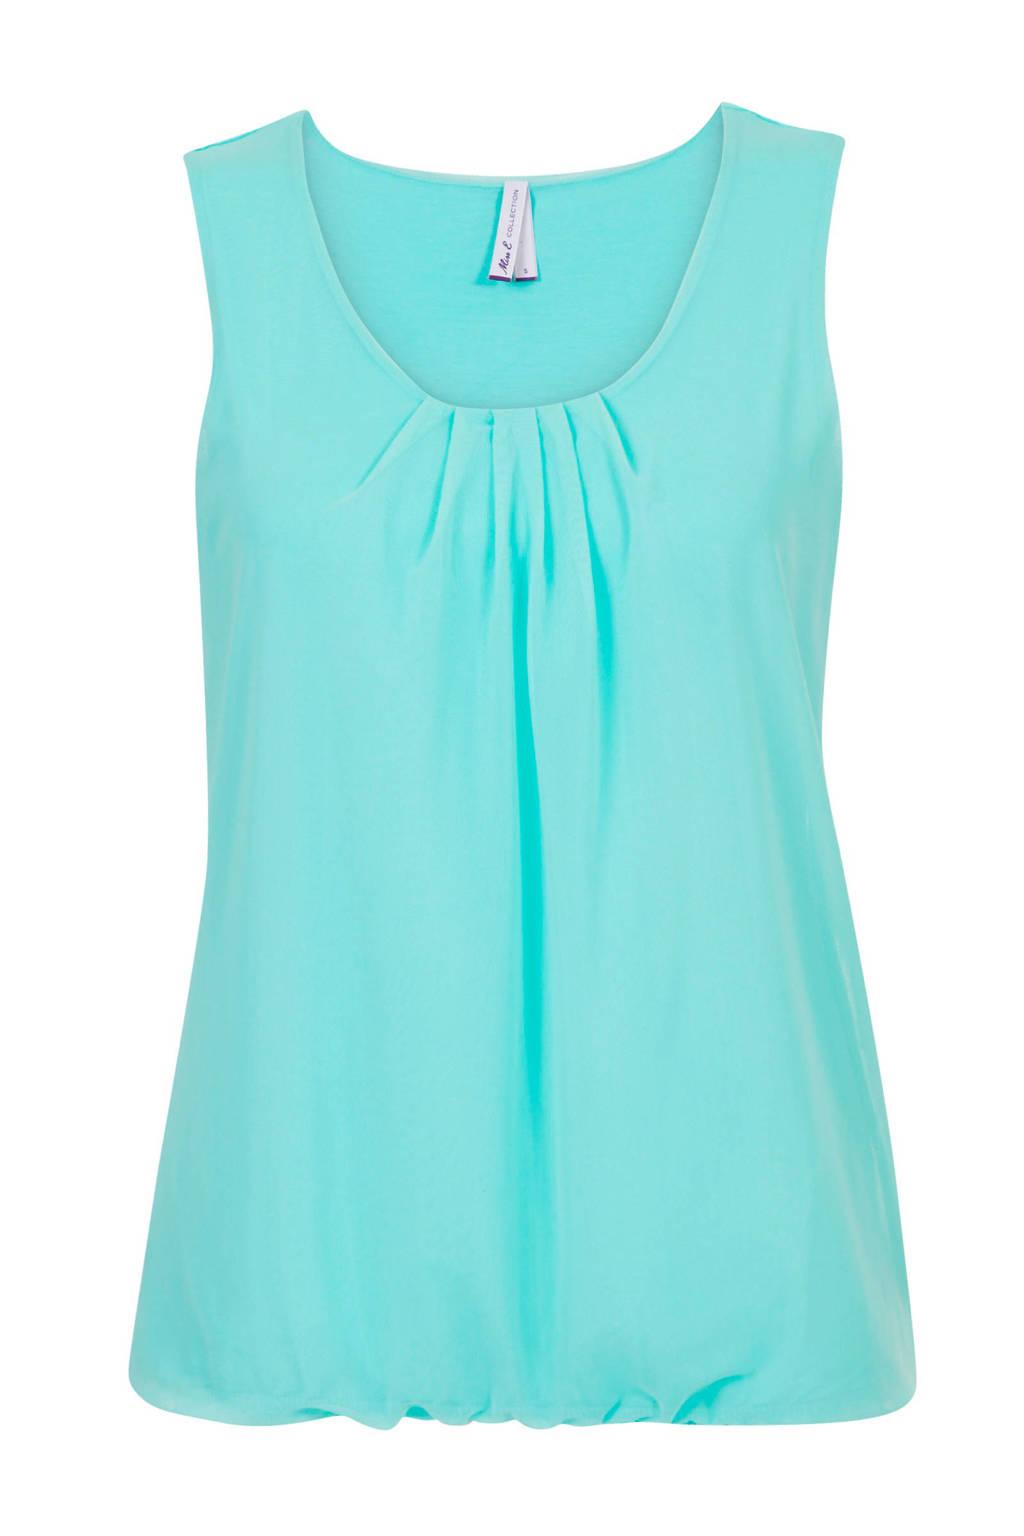 Miss Etam Regulier top turquoise, Turquoise